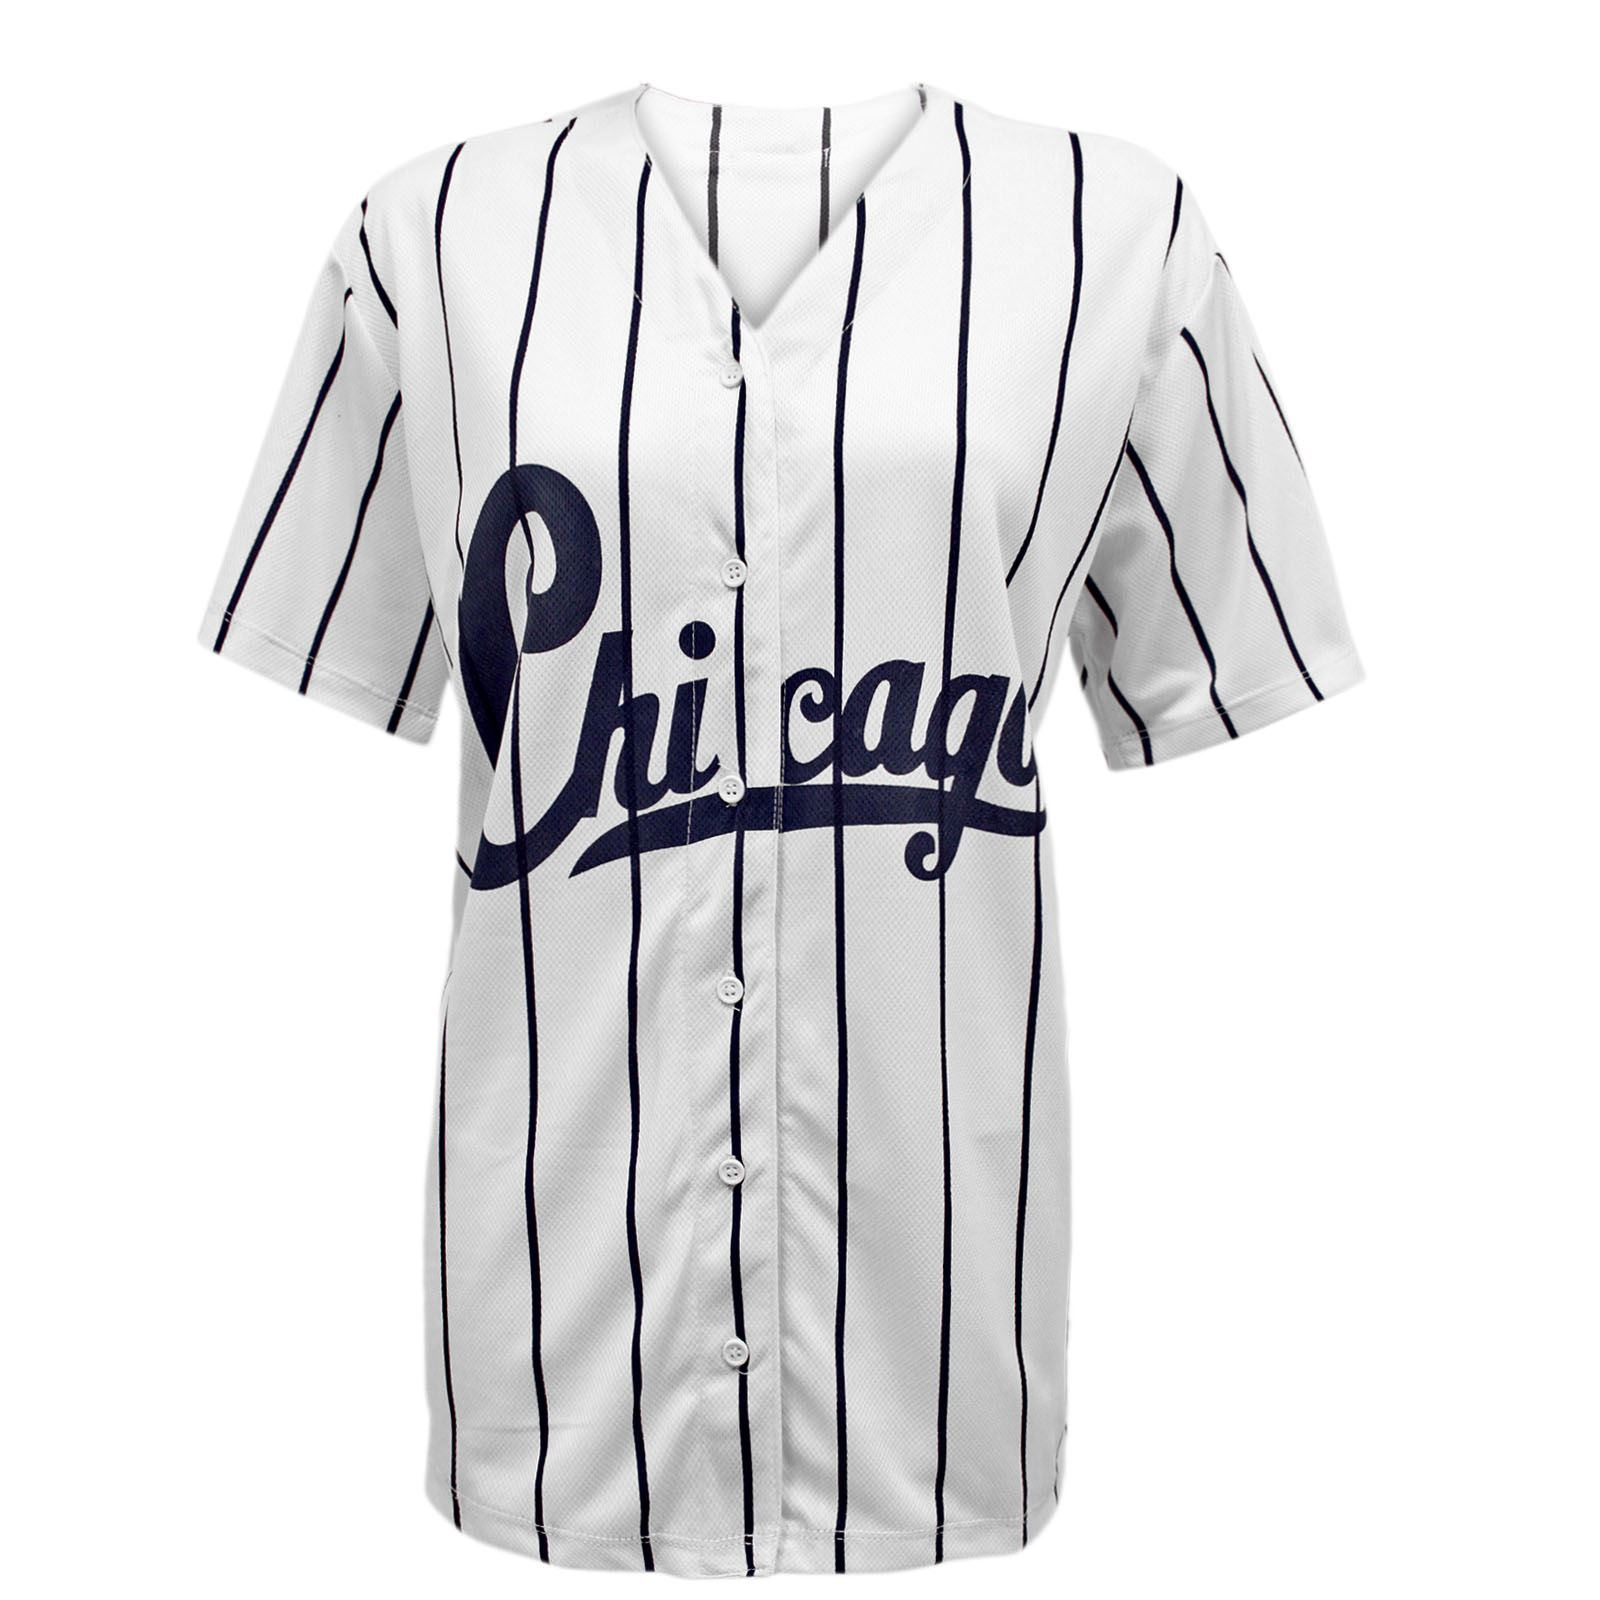 femmes chicago rayures am ricain baseball universit haut jersey t shirt ebay. Black Bedroom Furniture Sets. Home Design Ideas